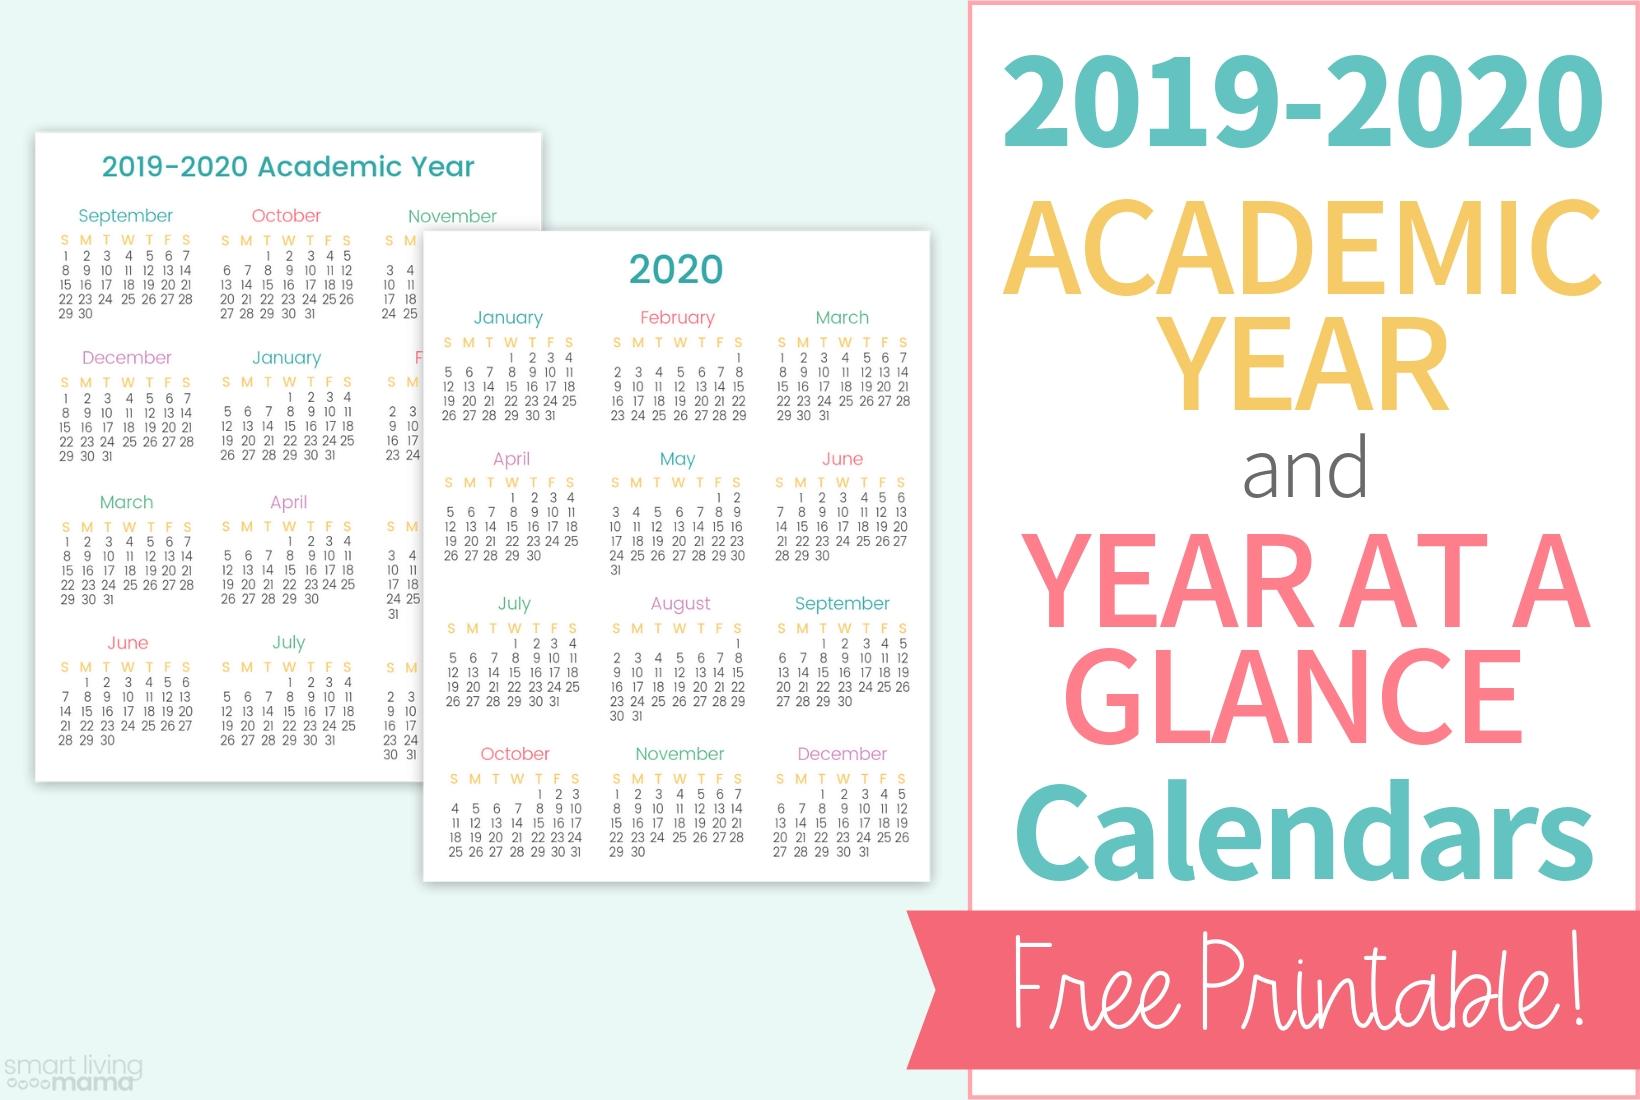 Colorful Printable Calendars For 2019-2020 | Smart Living Mama regarding Year At Glance Calendar Printable